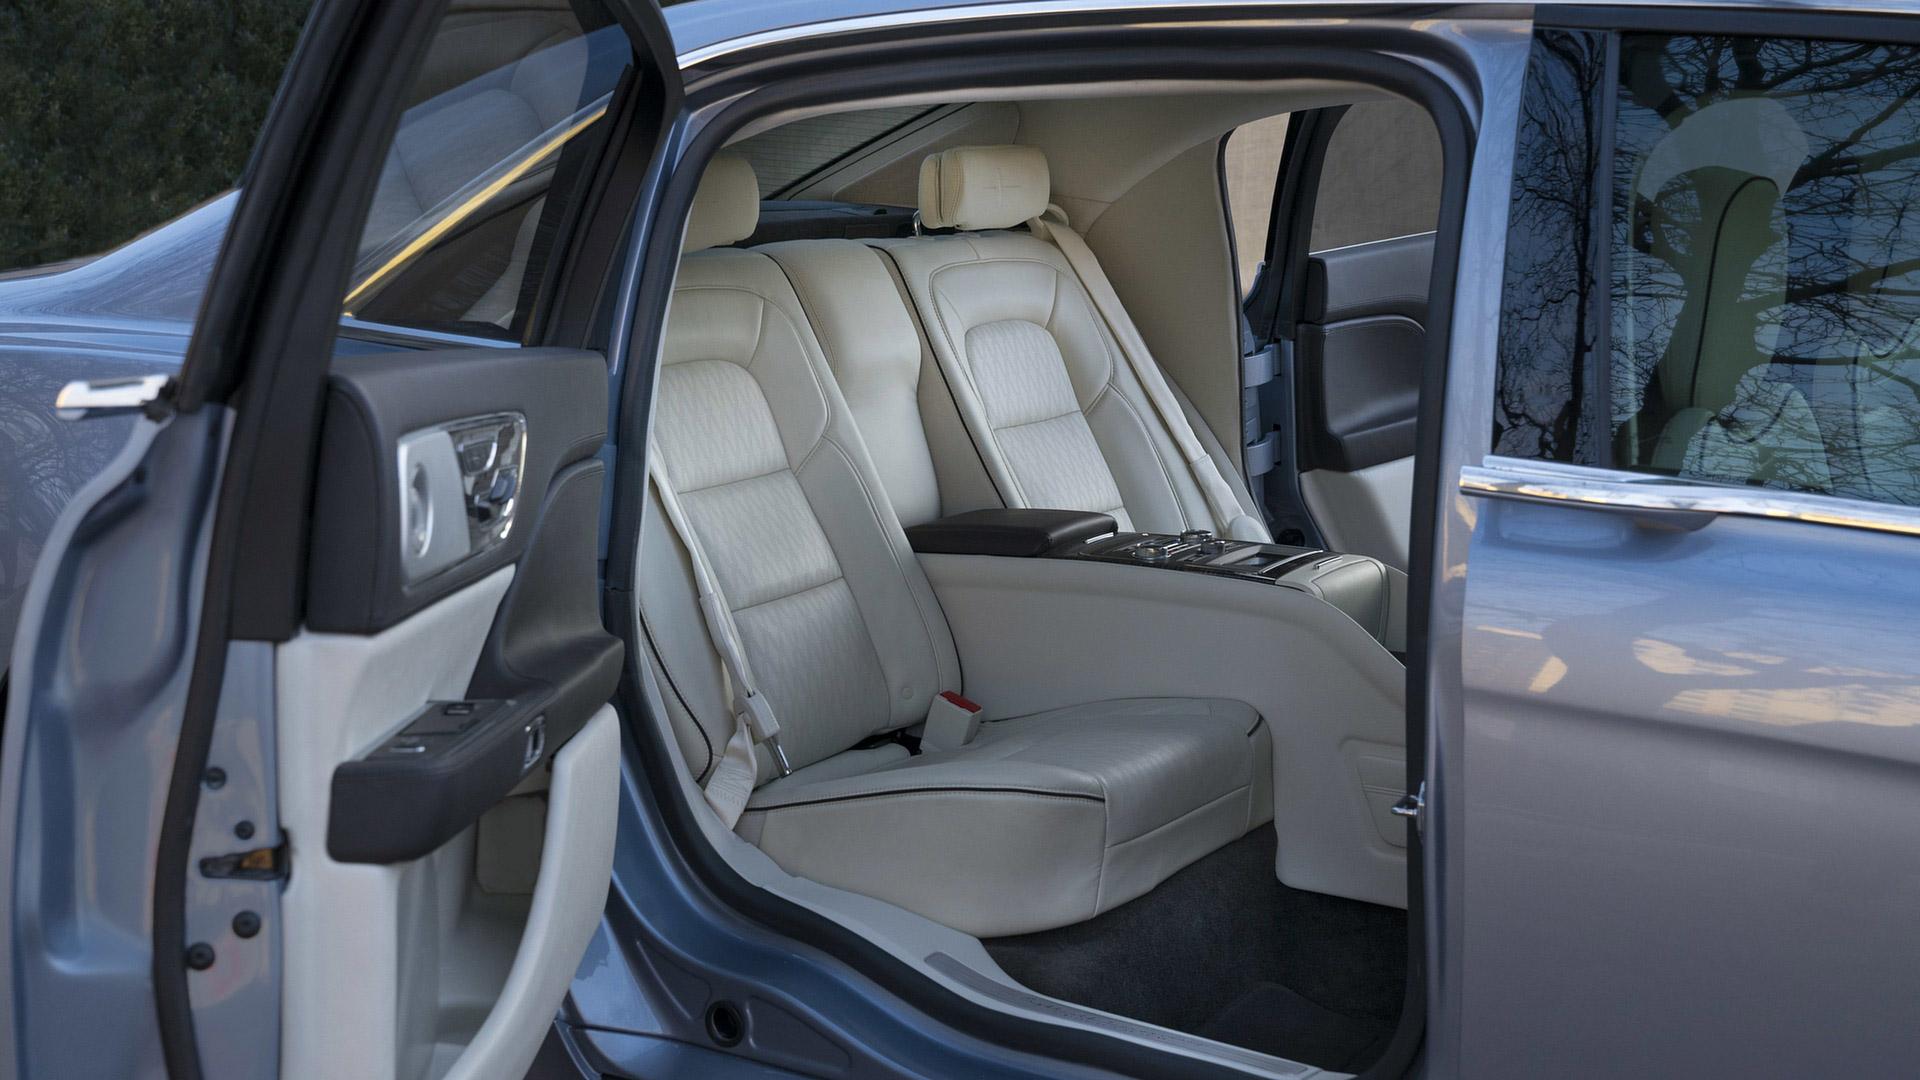 2019 Lincoln Continental Coach Door Edition Rear Seats